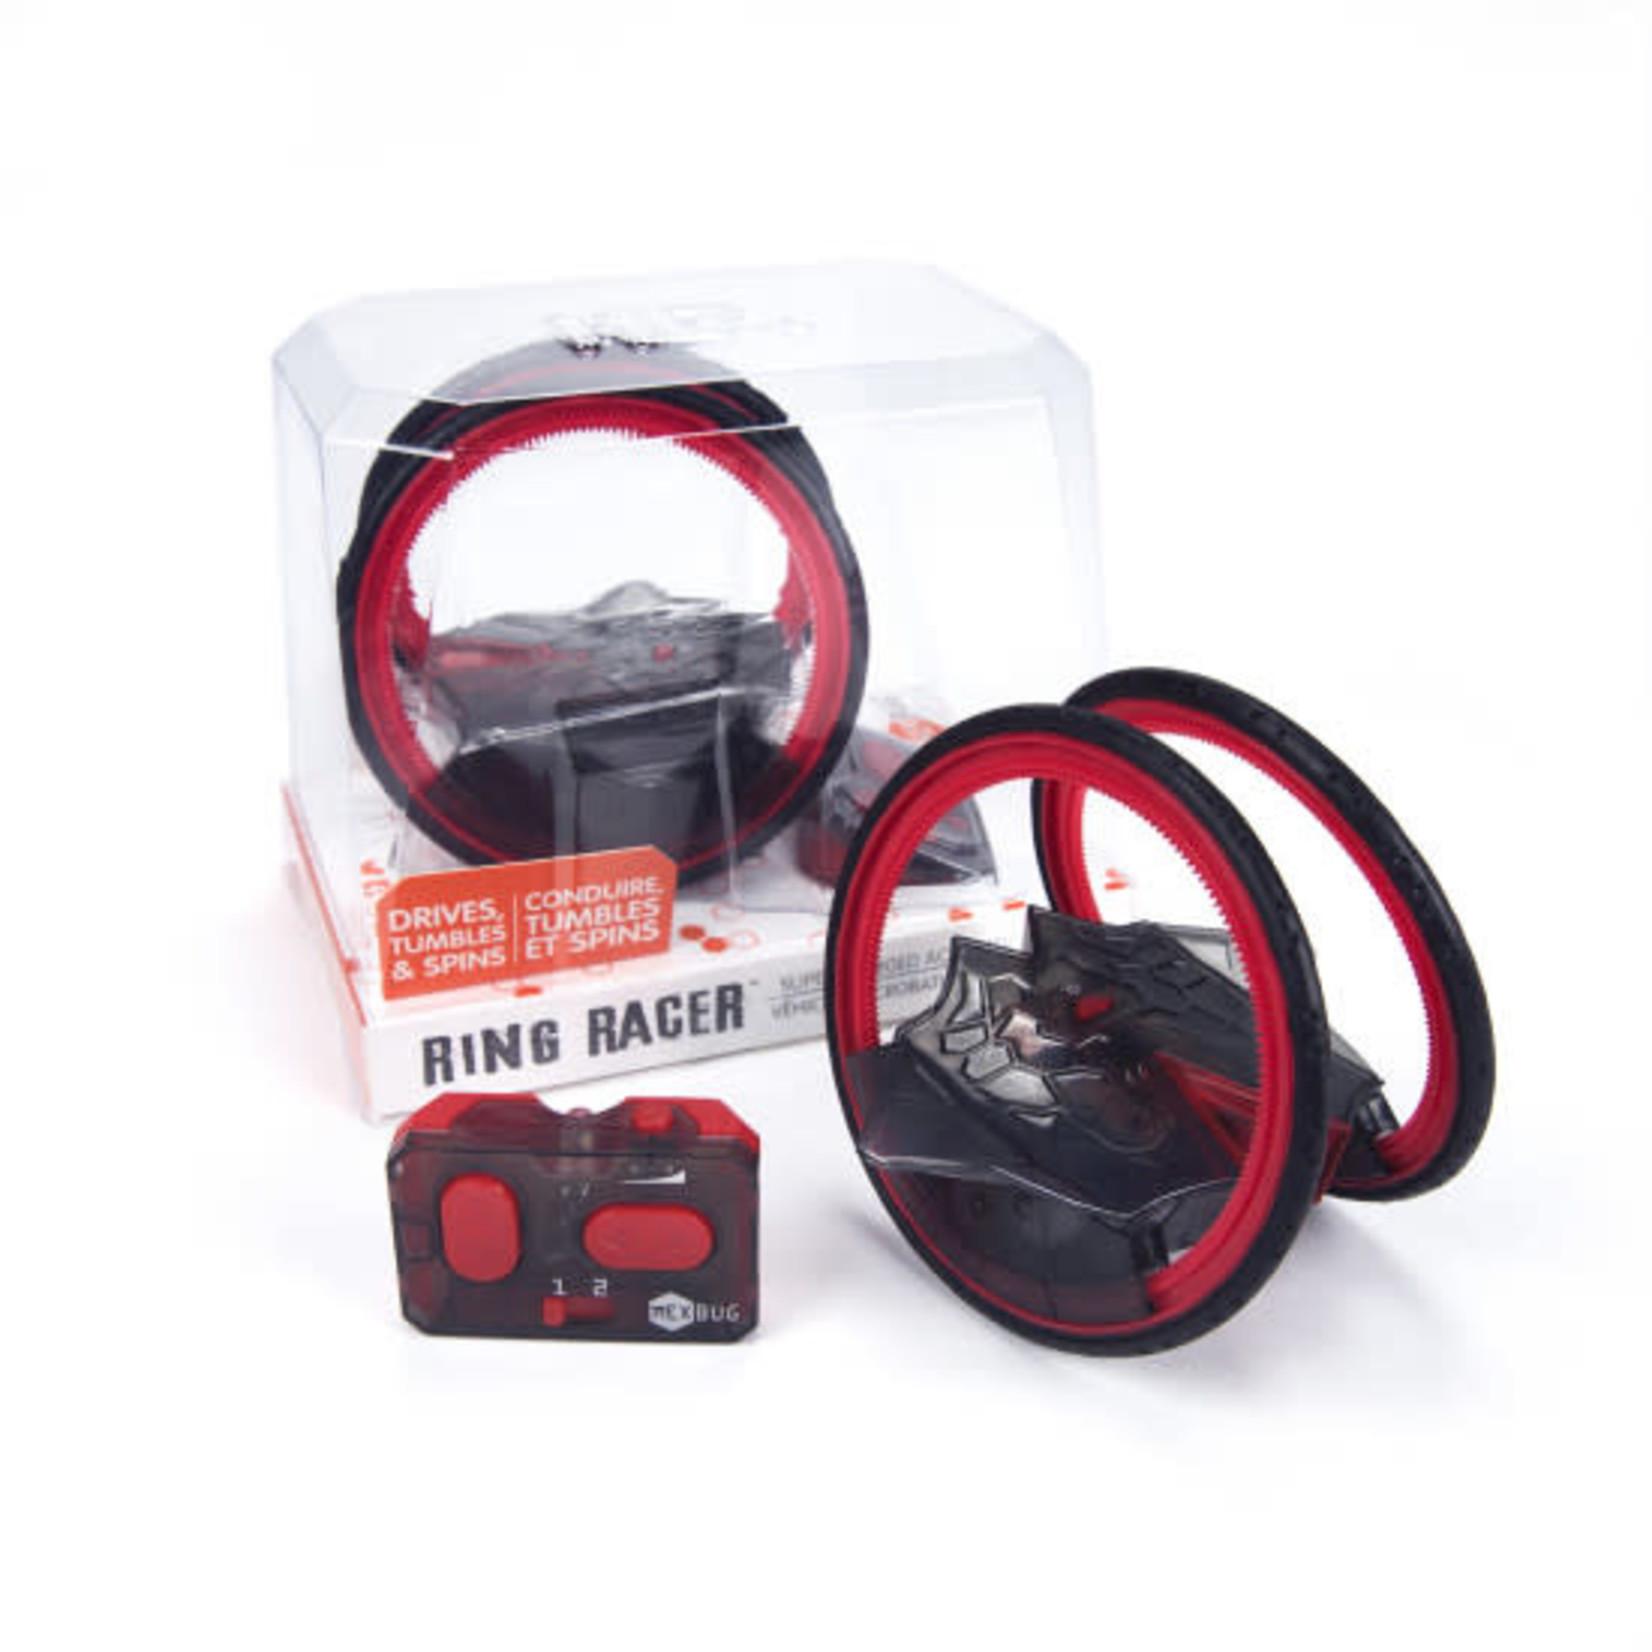 Innovation First HEXBUG Ring Racer Robot